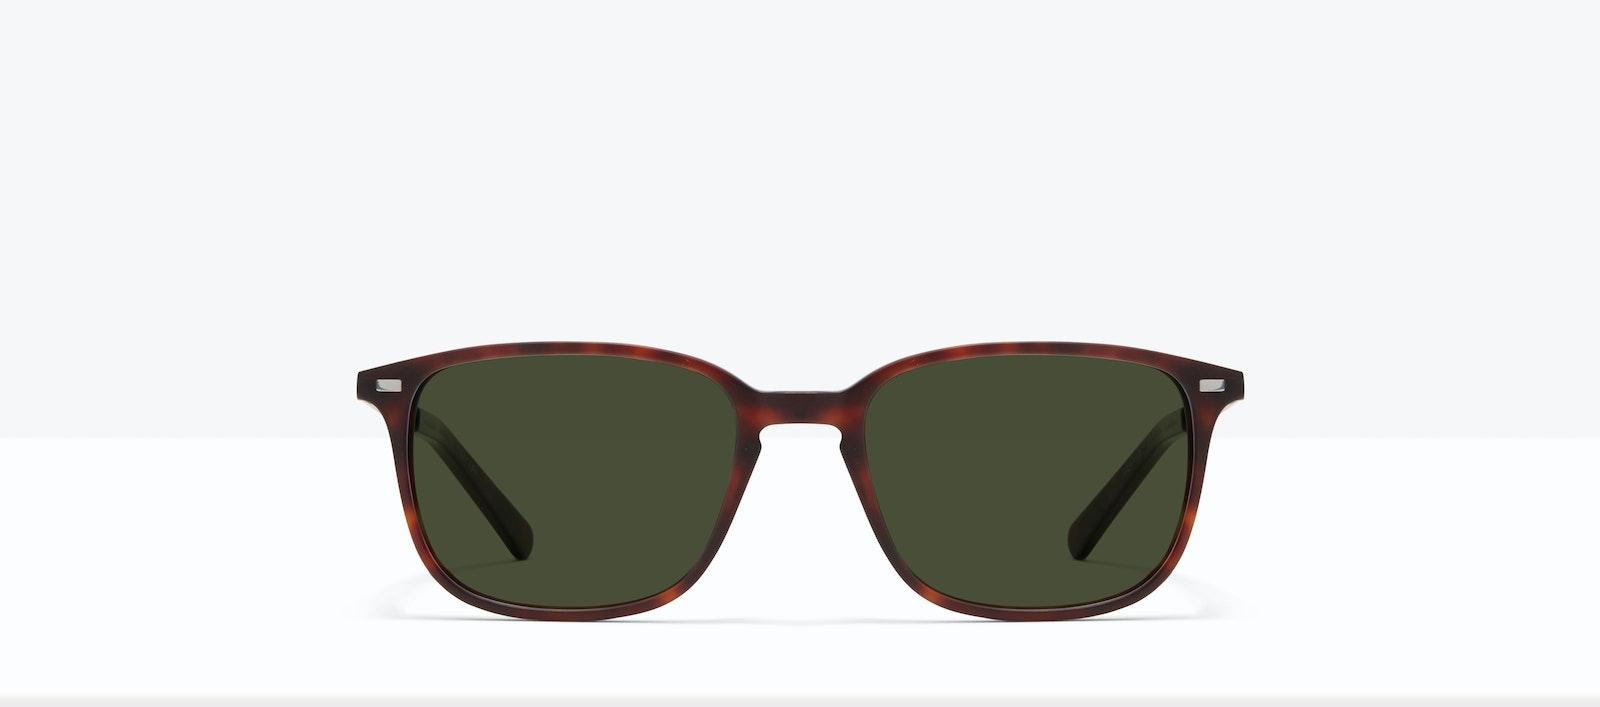 Affordable Fashion Glasses Rectangle Sunglasses Men Sharp S Matte Tort Front